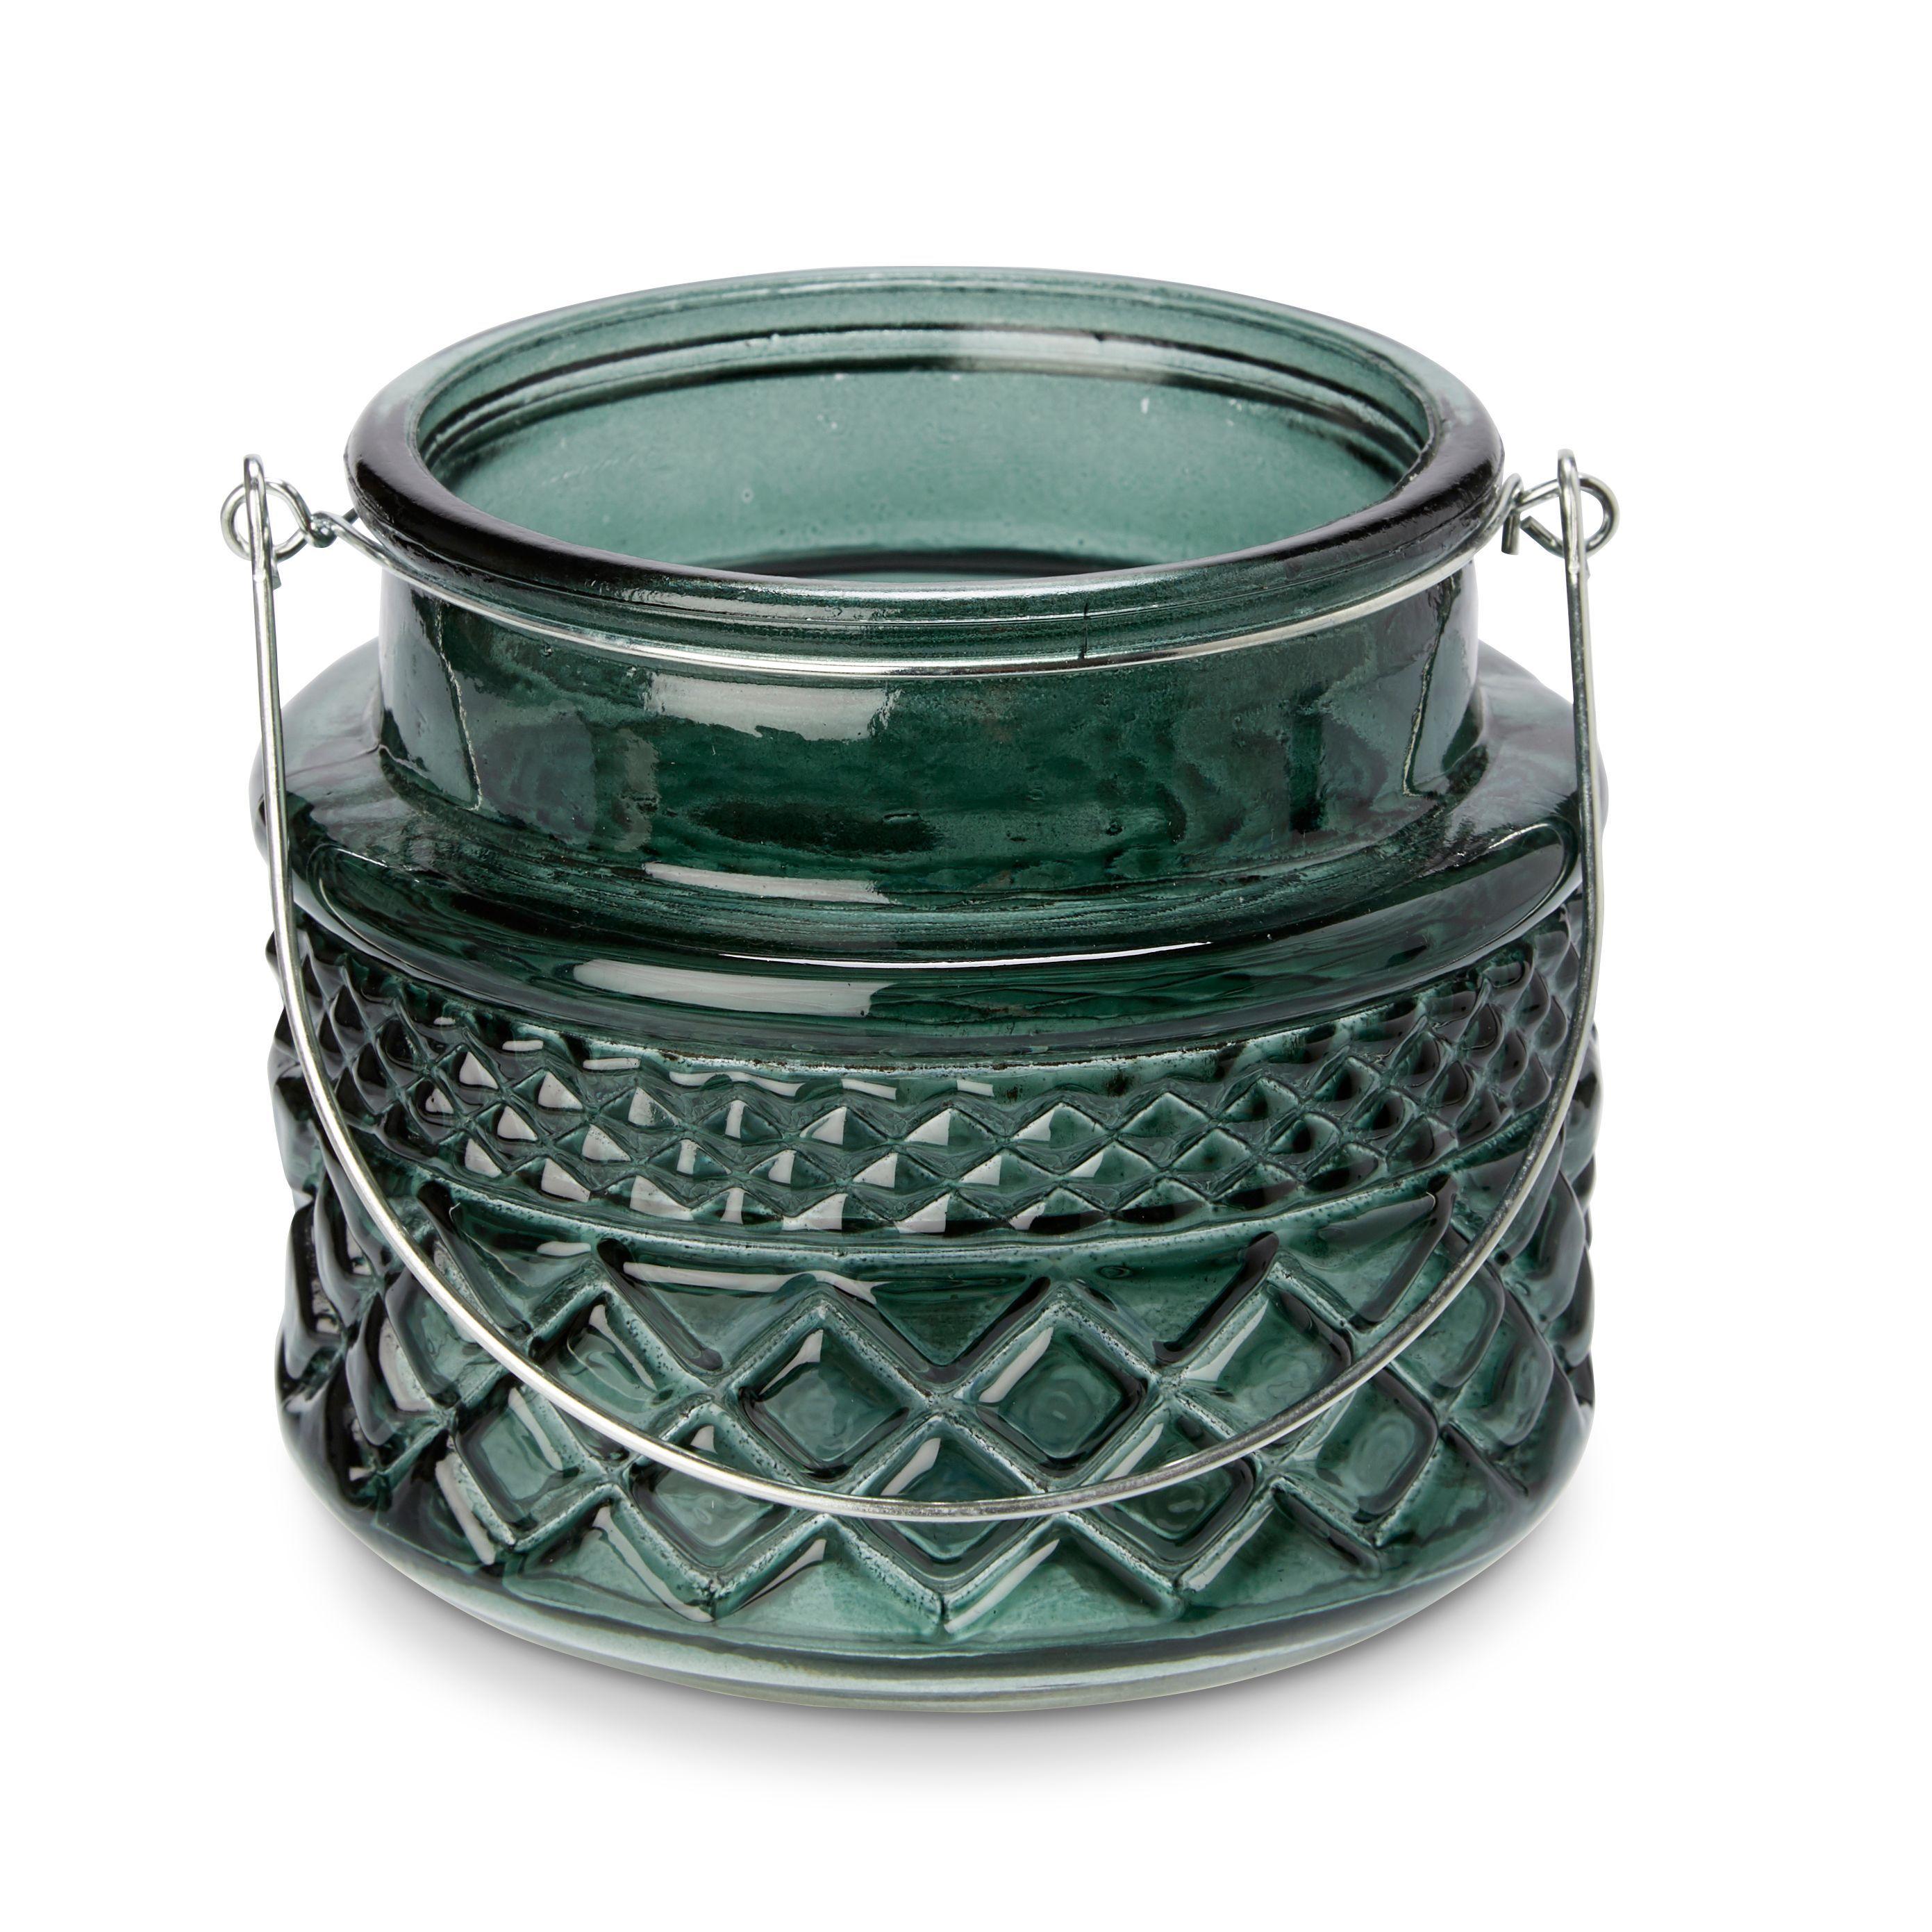 Green Embossed Glass Tealight Holder, Small